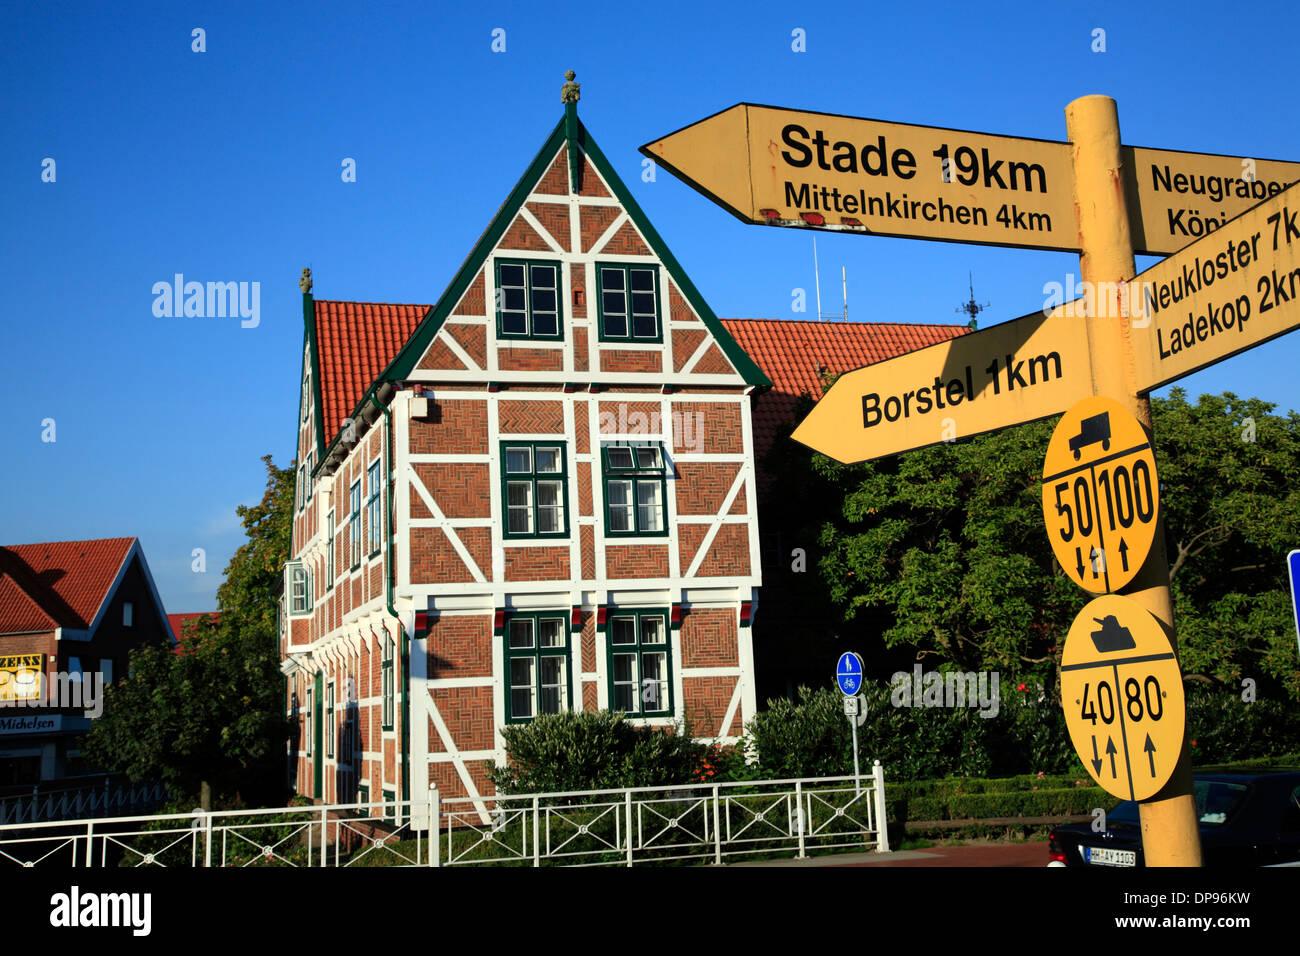 Altes Land, Jork, trafic signe et mairie, Basse-Saxe, Allemagne, Europe Photo Stock